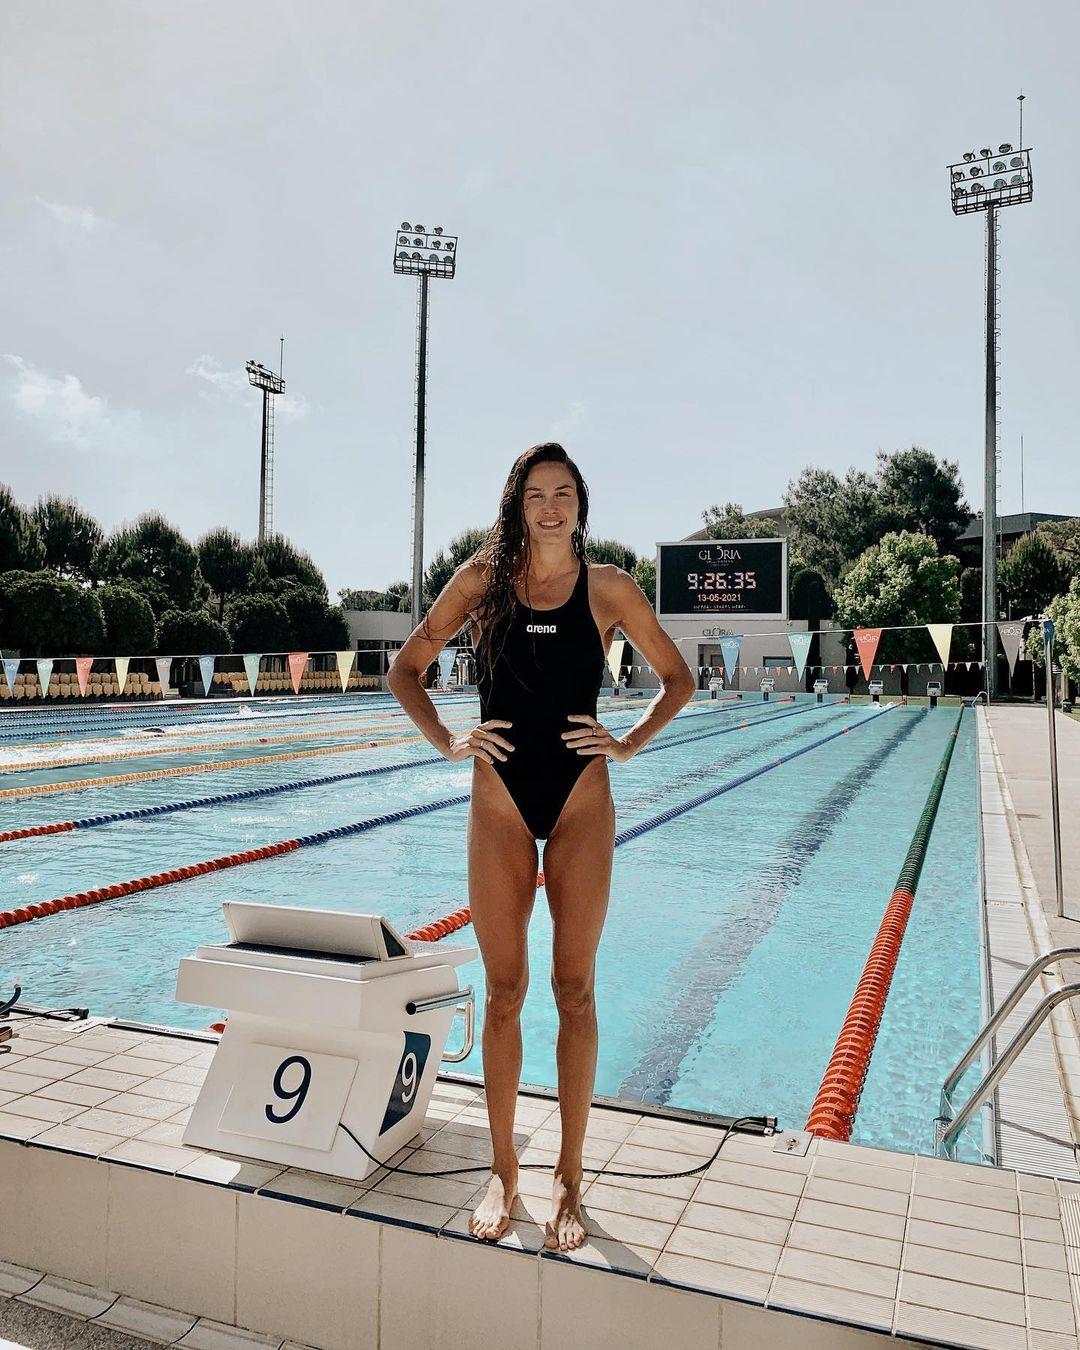 Zsuzsanna Jakabos in swim suit